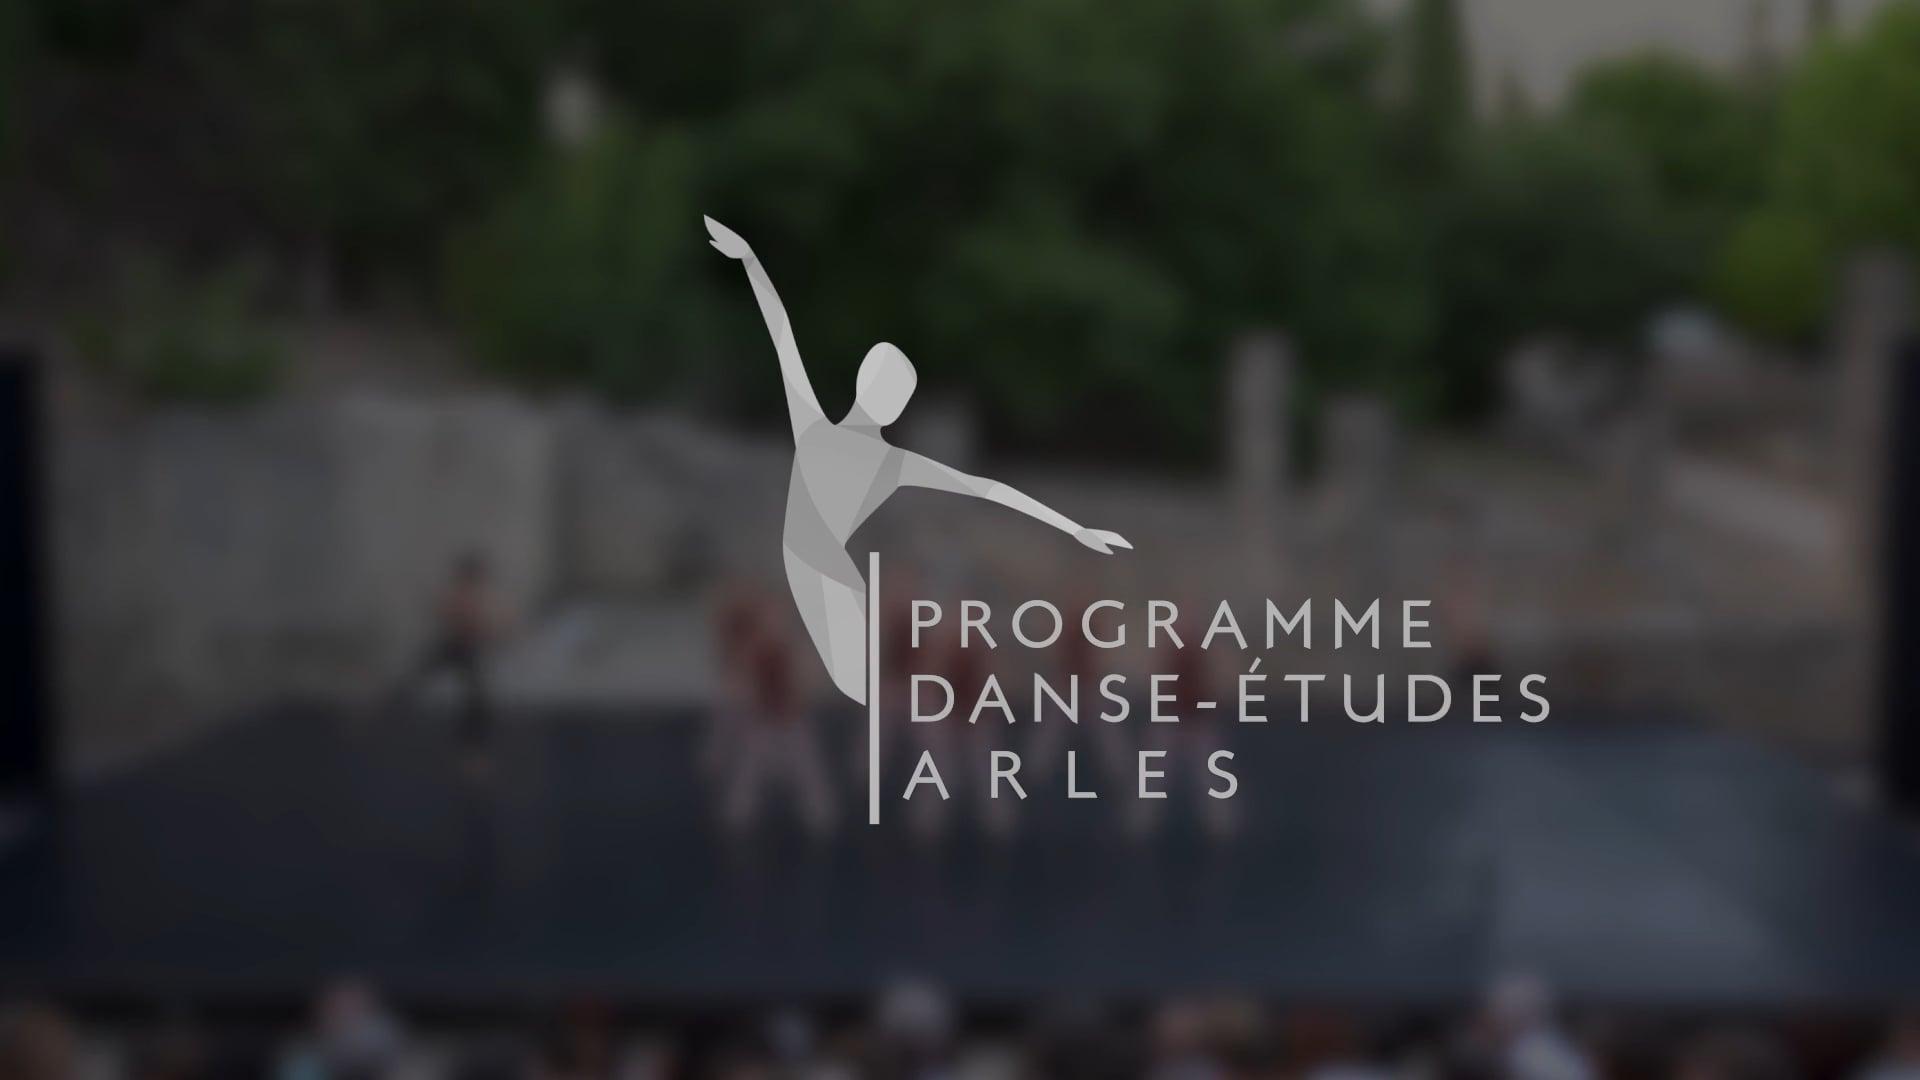 Danse en corps - programme danse-études